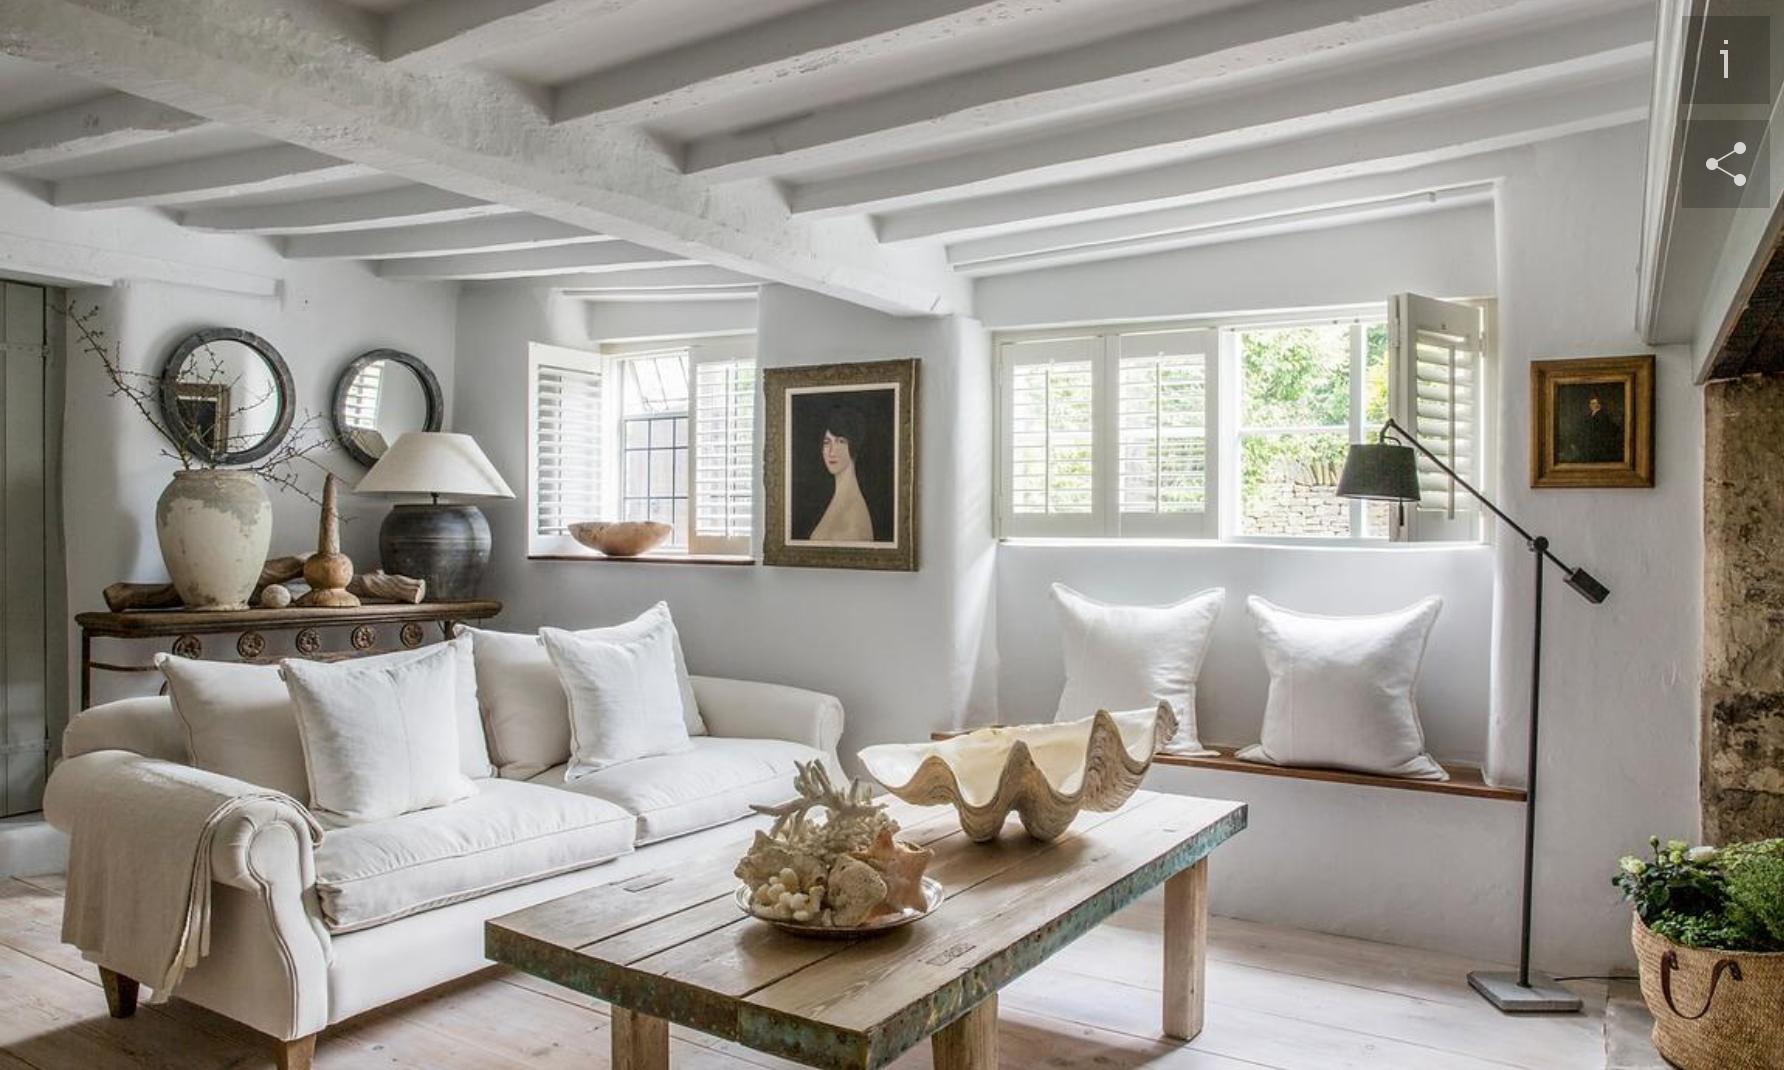 white beam open ceilings, rustic modern bohemian interiors,